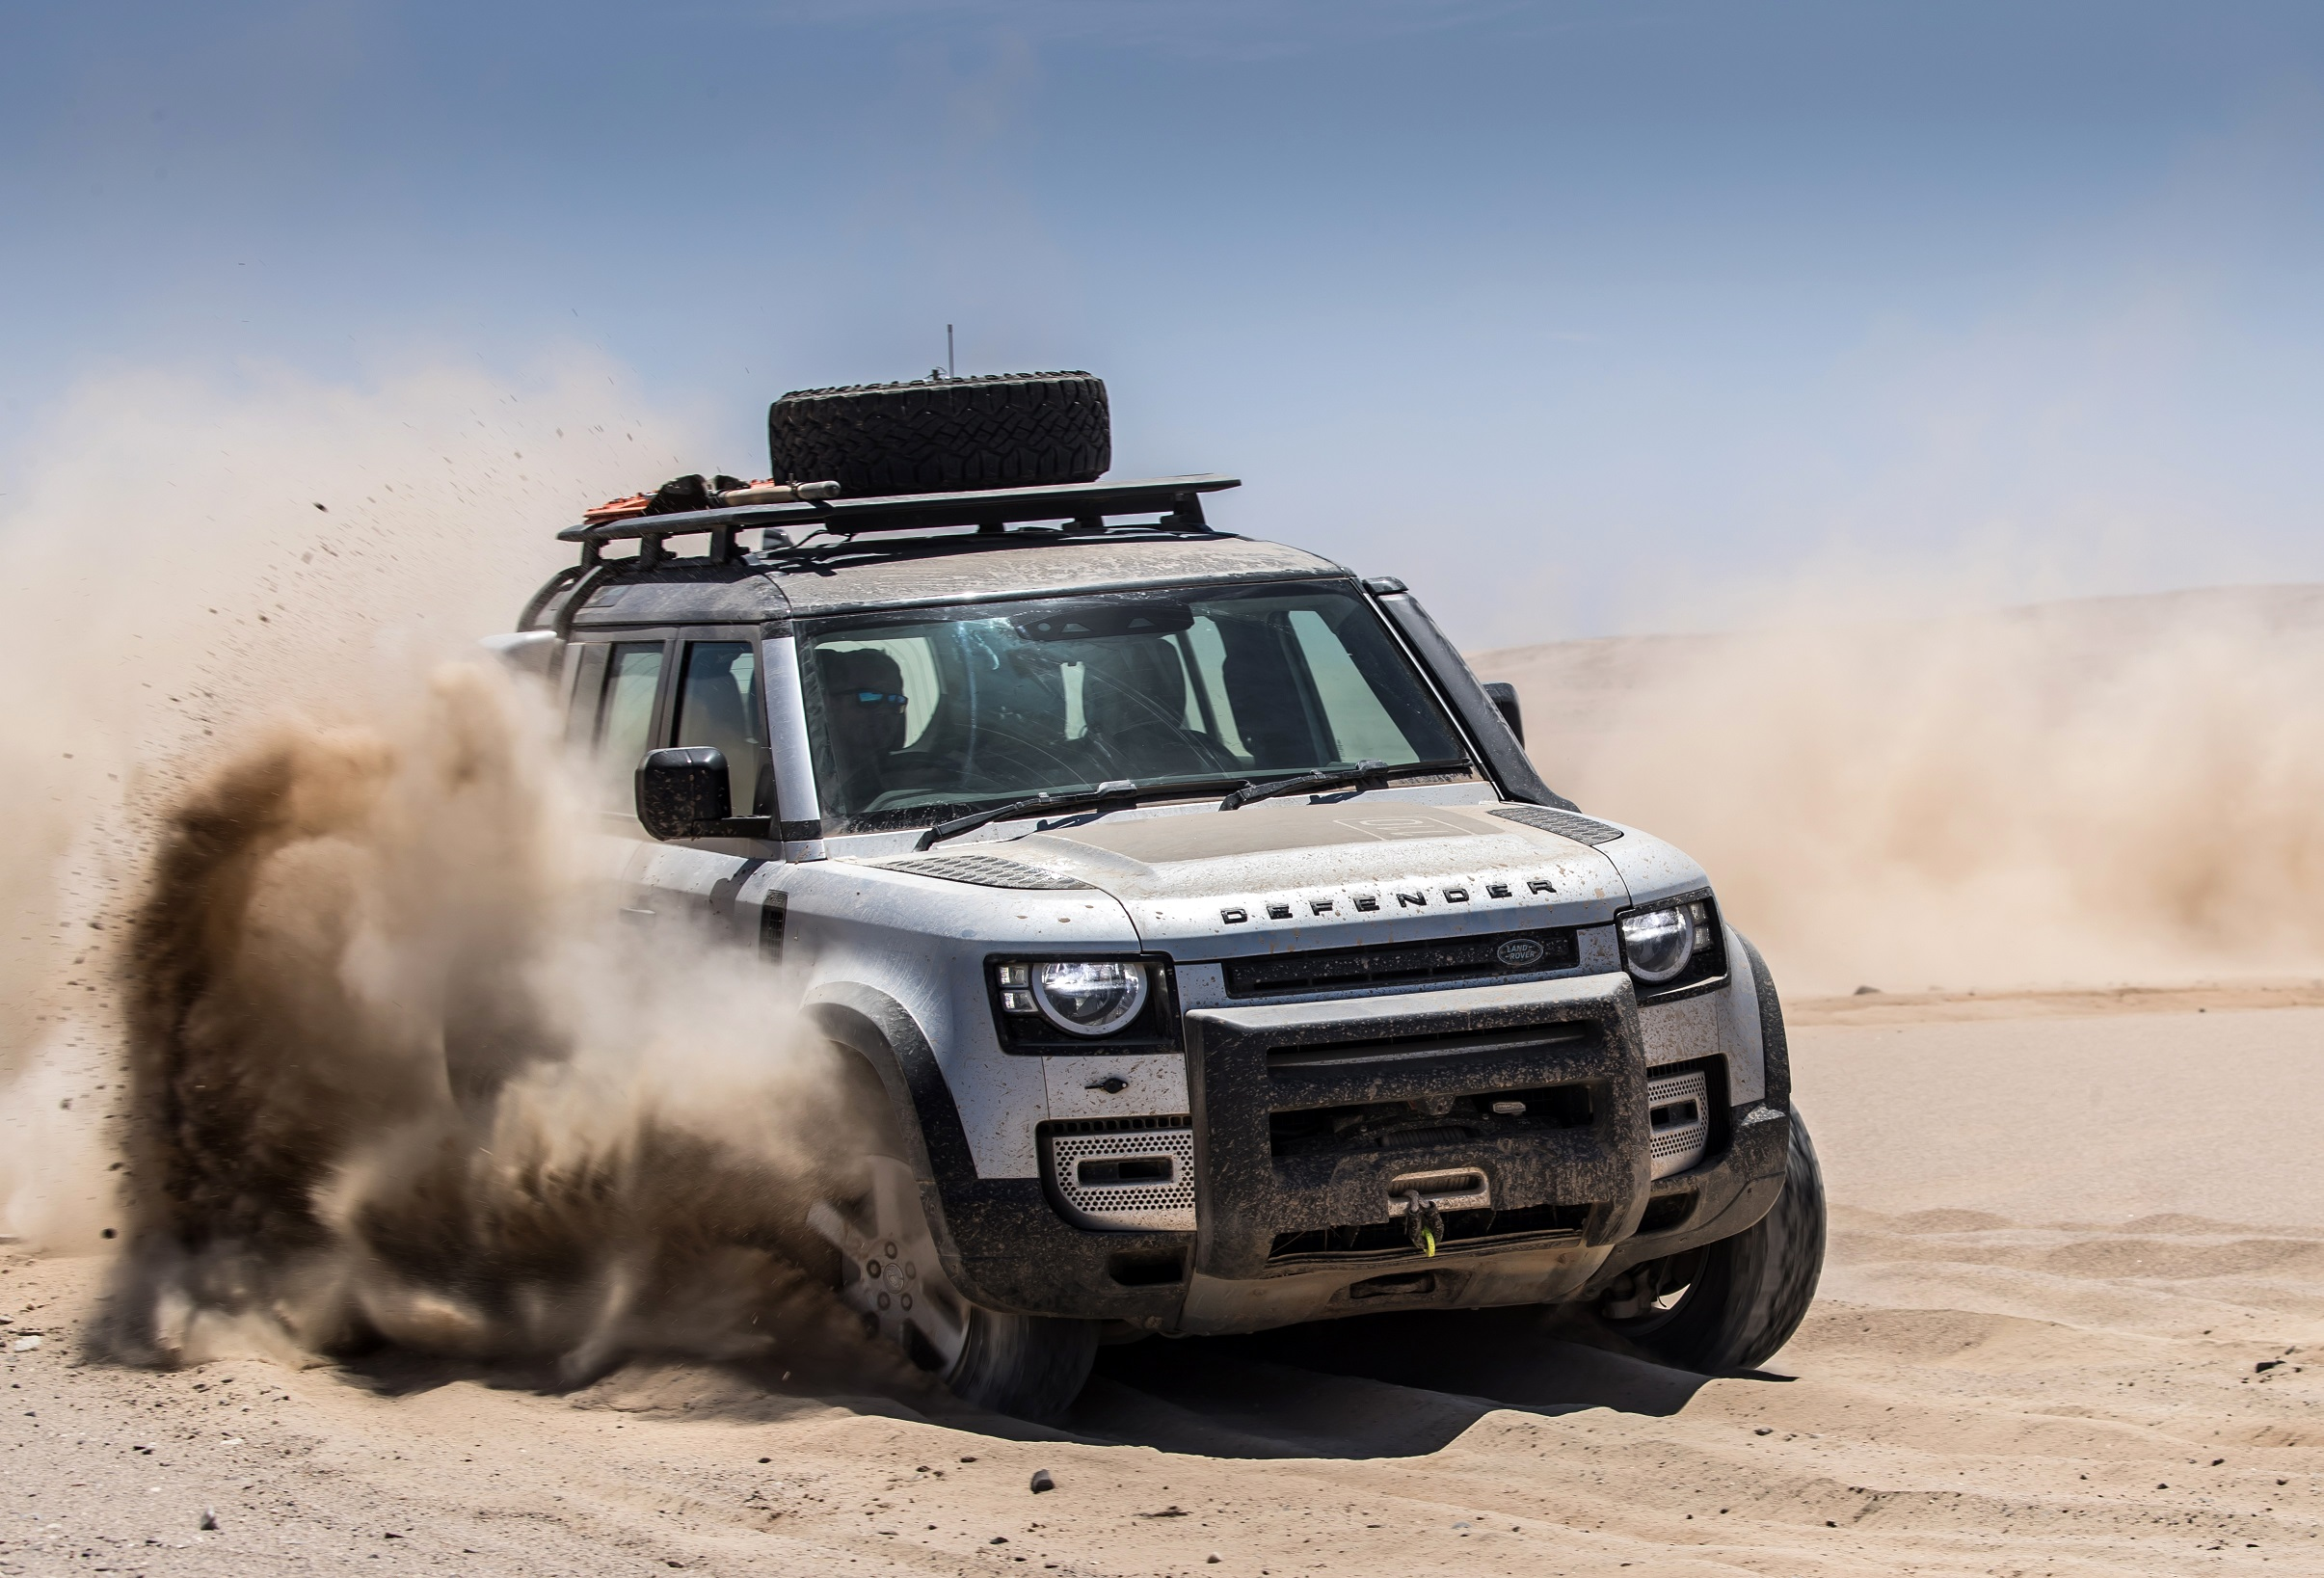 Jaguar Land Rover Using Aerospace Technology To Develop Future Lightweight Vehicles